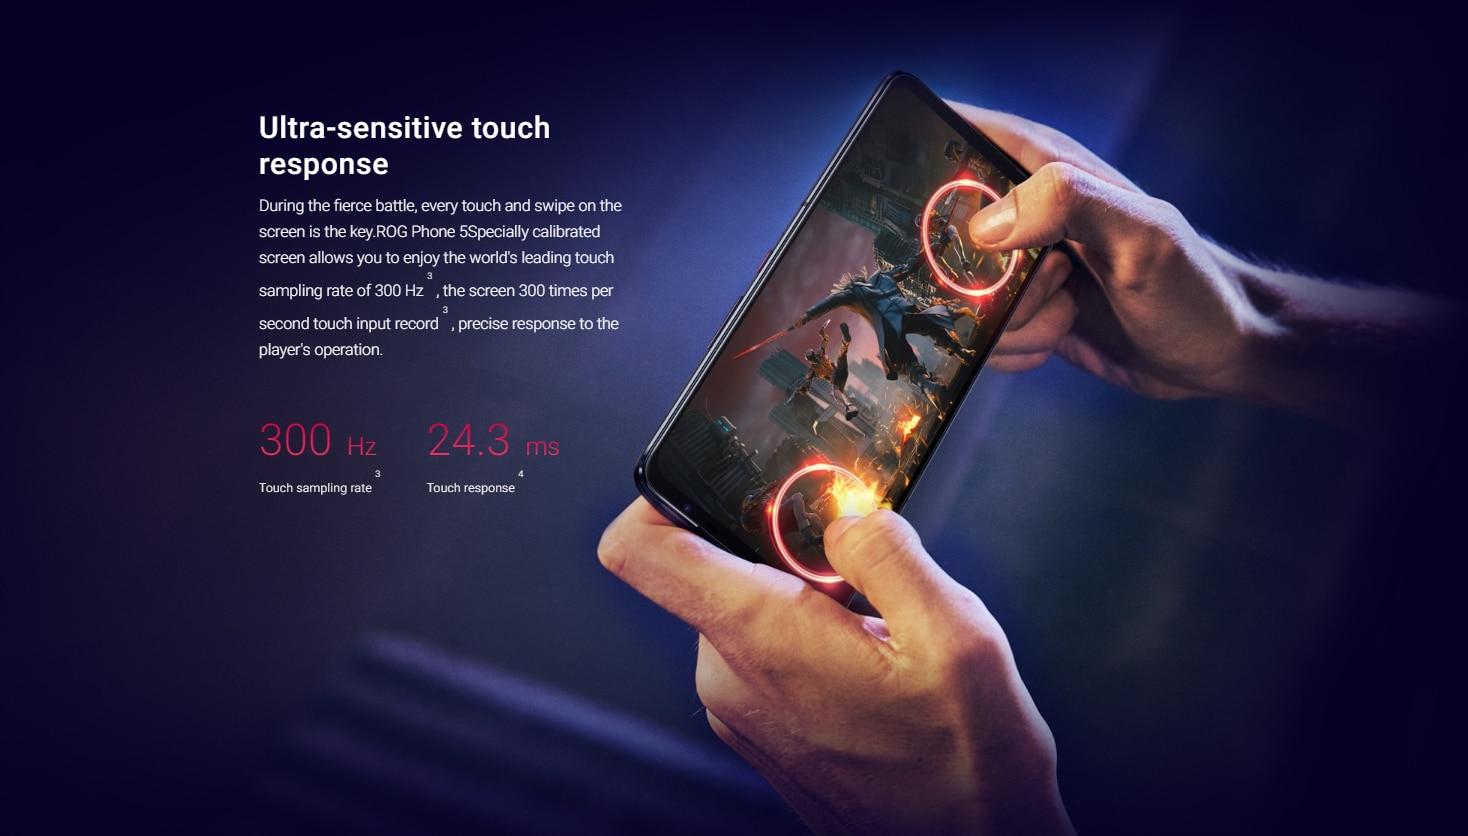 Original Asus ROG 5 5G Gaming Phone  Snapdragon 888 Fast Charging 6.78